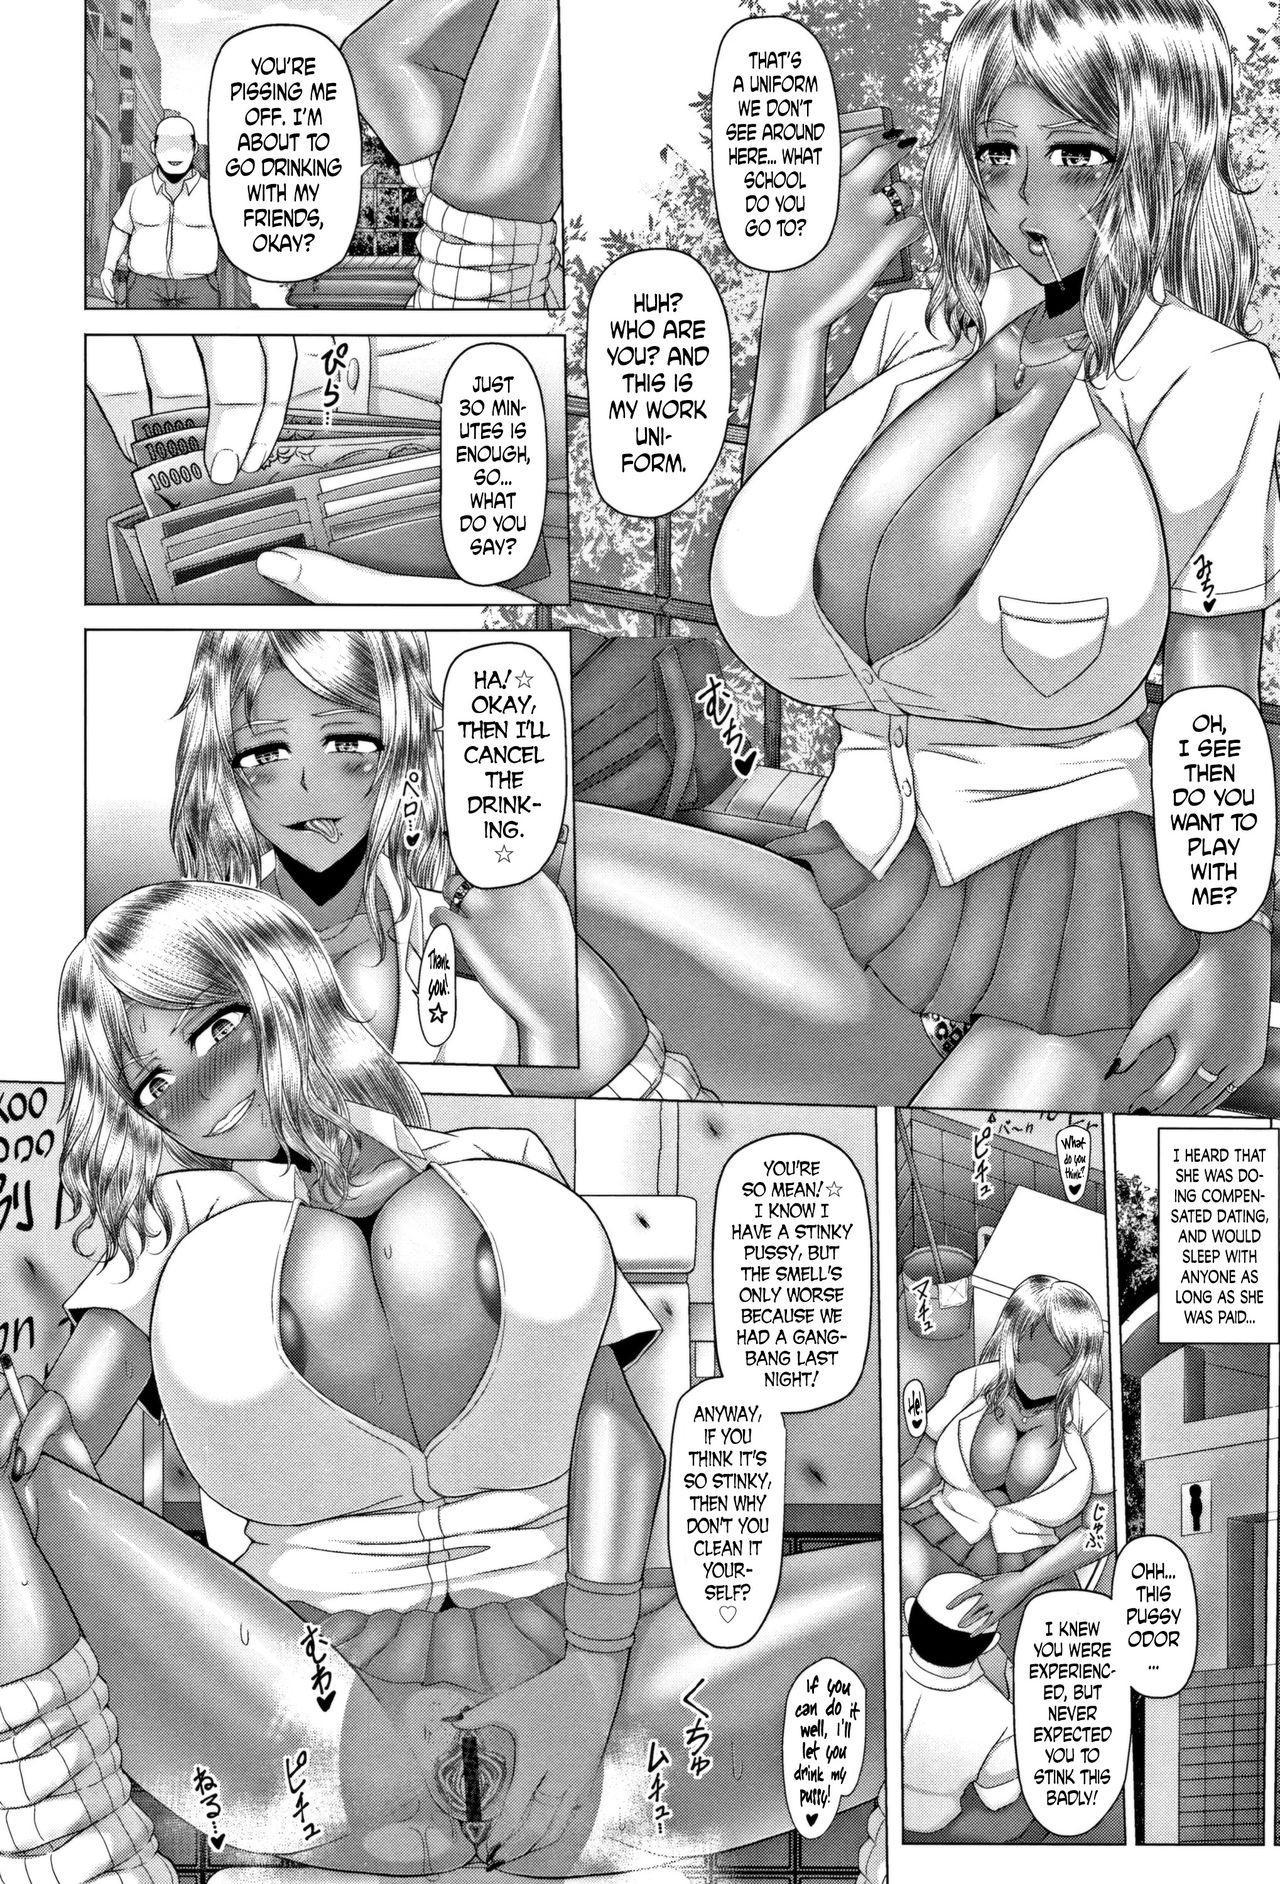 [Inoue Nanaki] Joushiki Daha! Kuro Gal Bitch-ka Seikatsu Ch. 1-3, 5-8 [English] [Dark Mac + N04h] 73